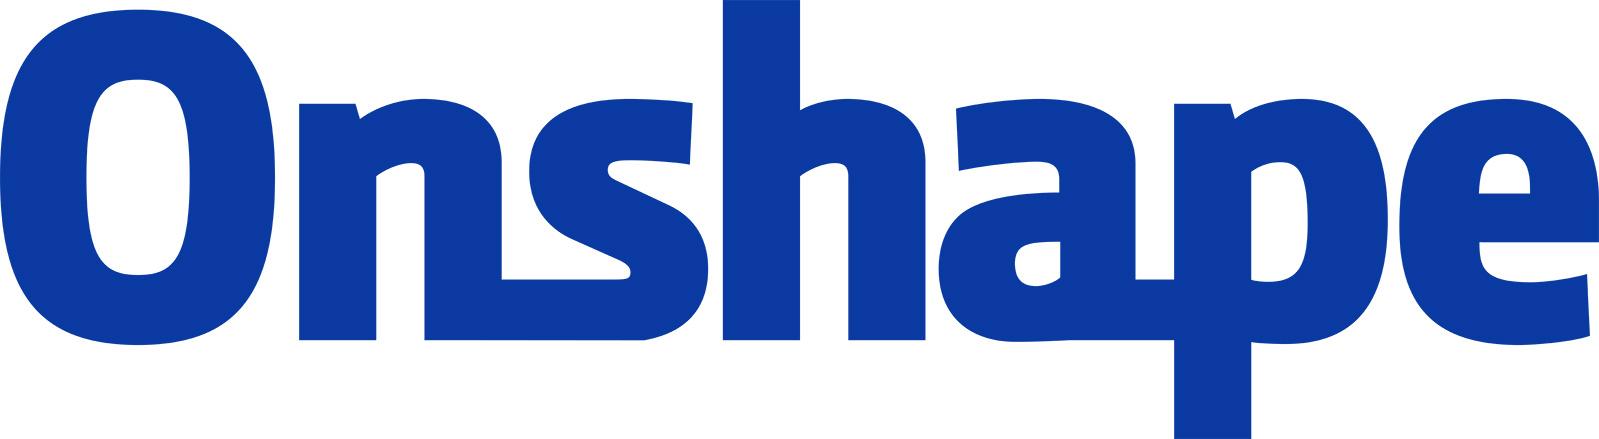 onshape-logo.jpg